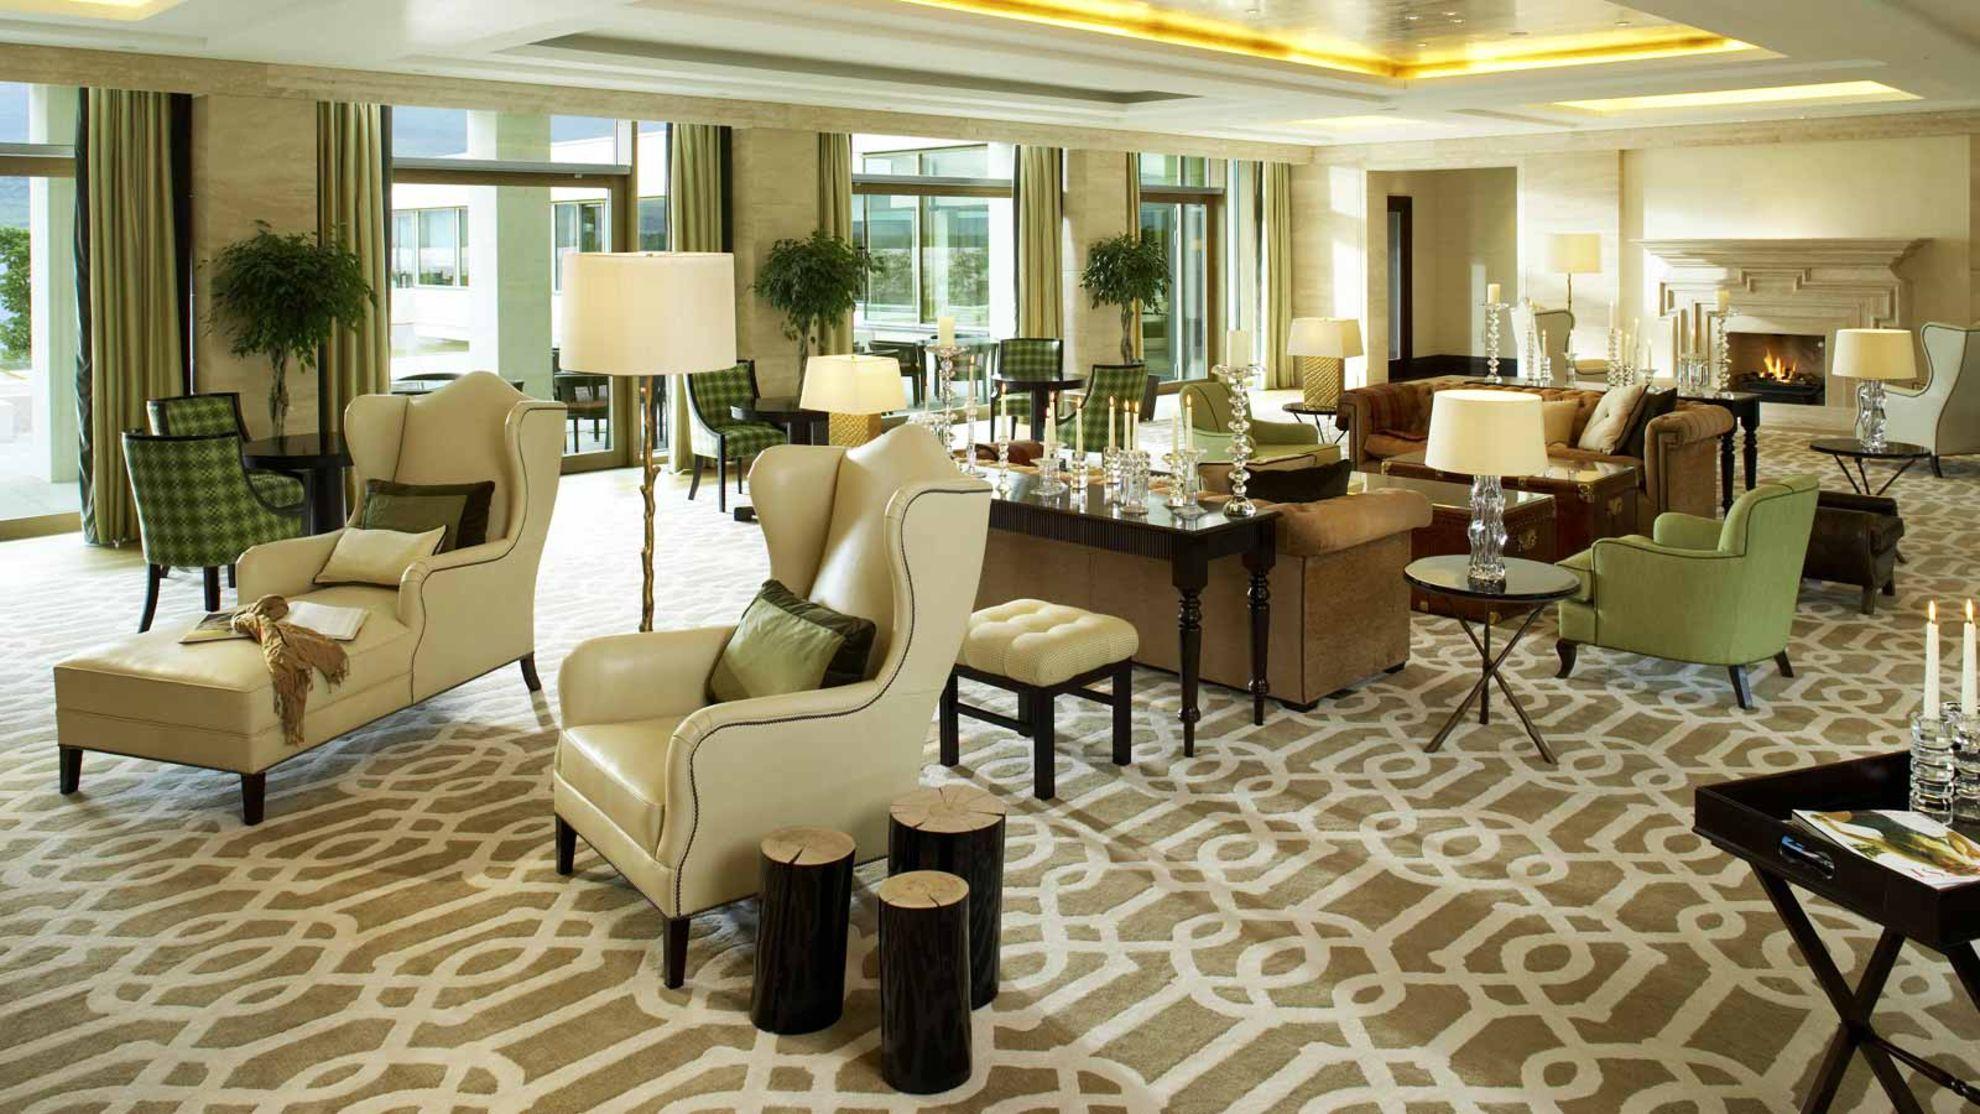 Luxury 5 Star Hotels In Killarney Ireland The Europe Hotel